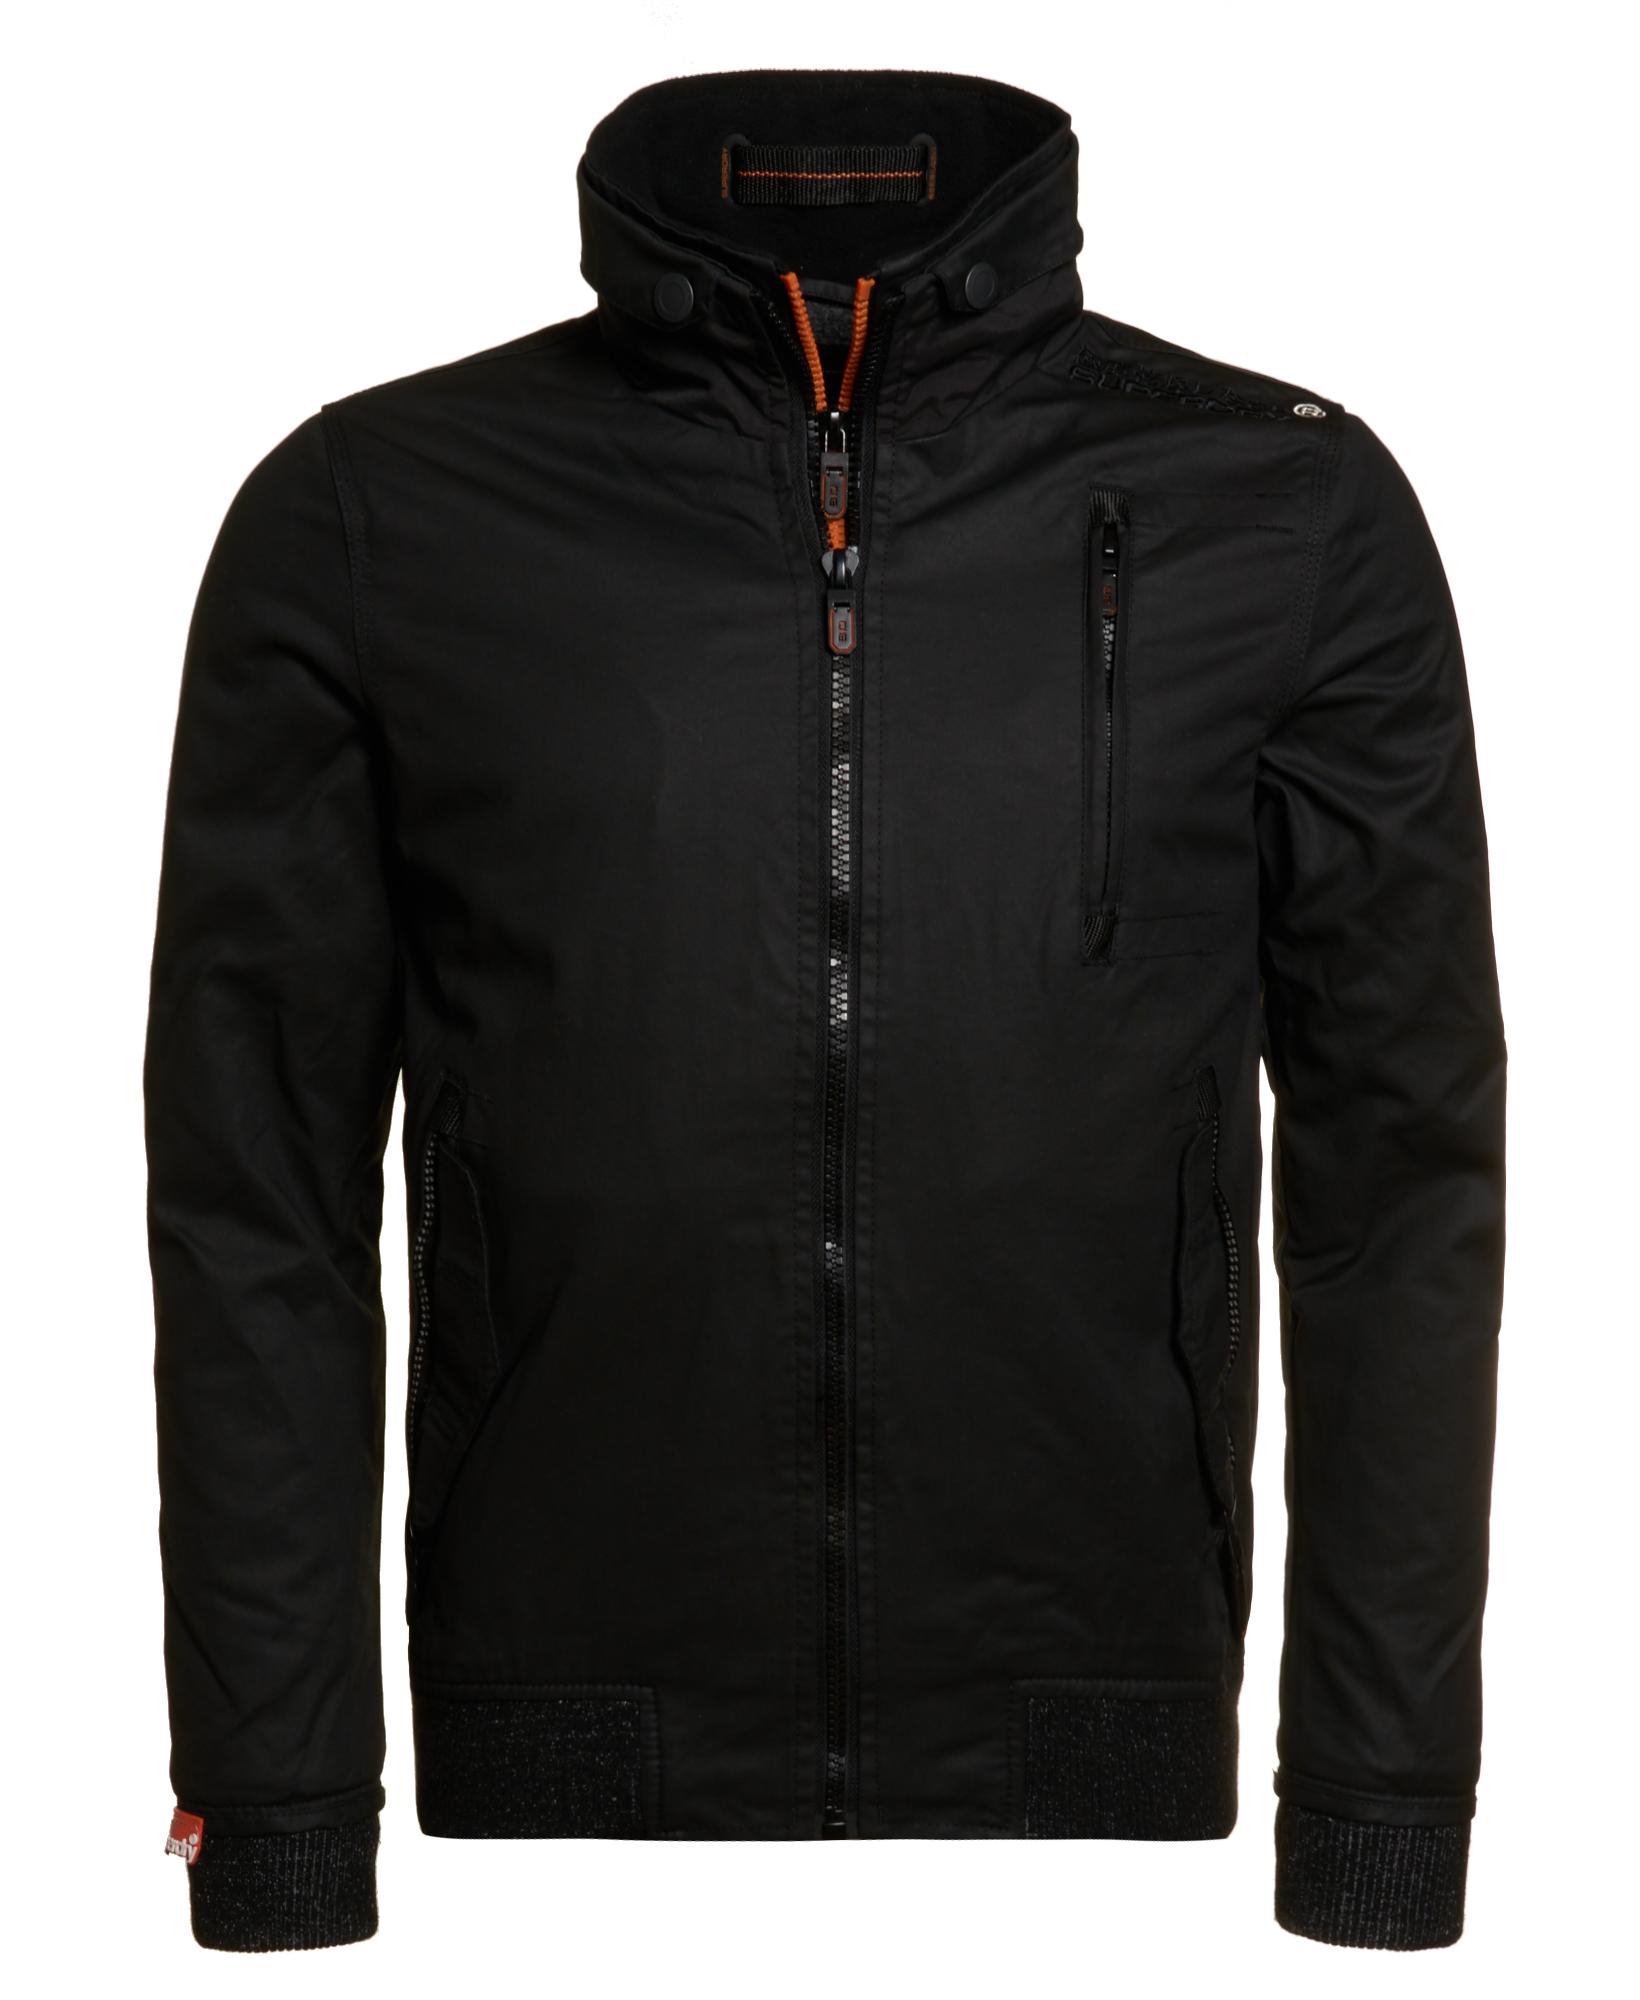 Superdry mens jacket sale